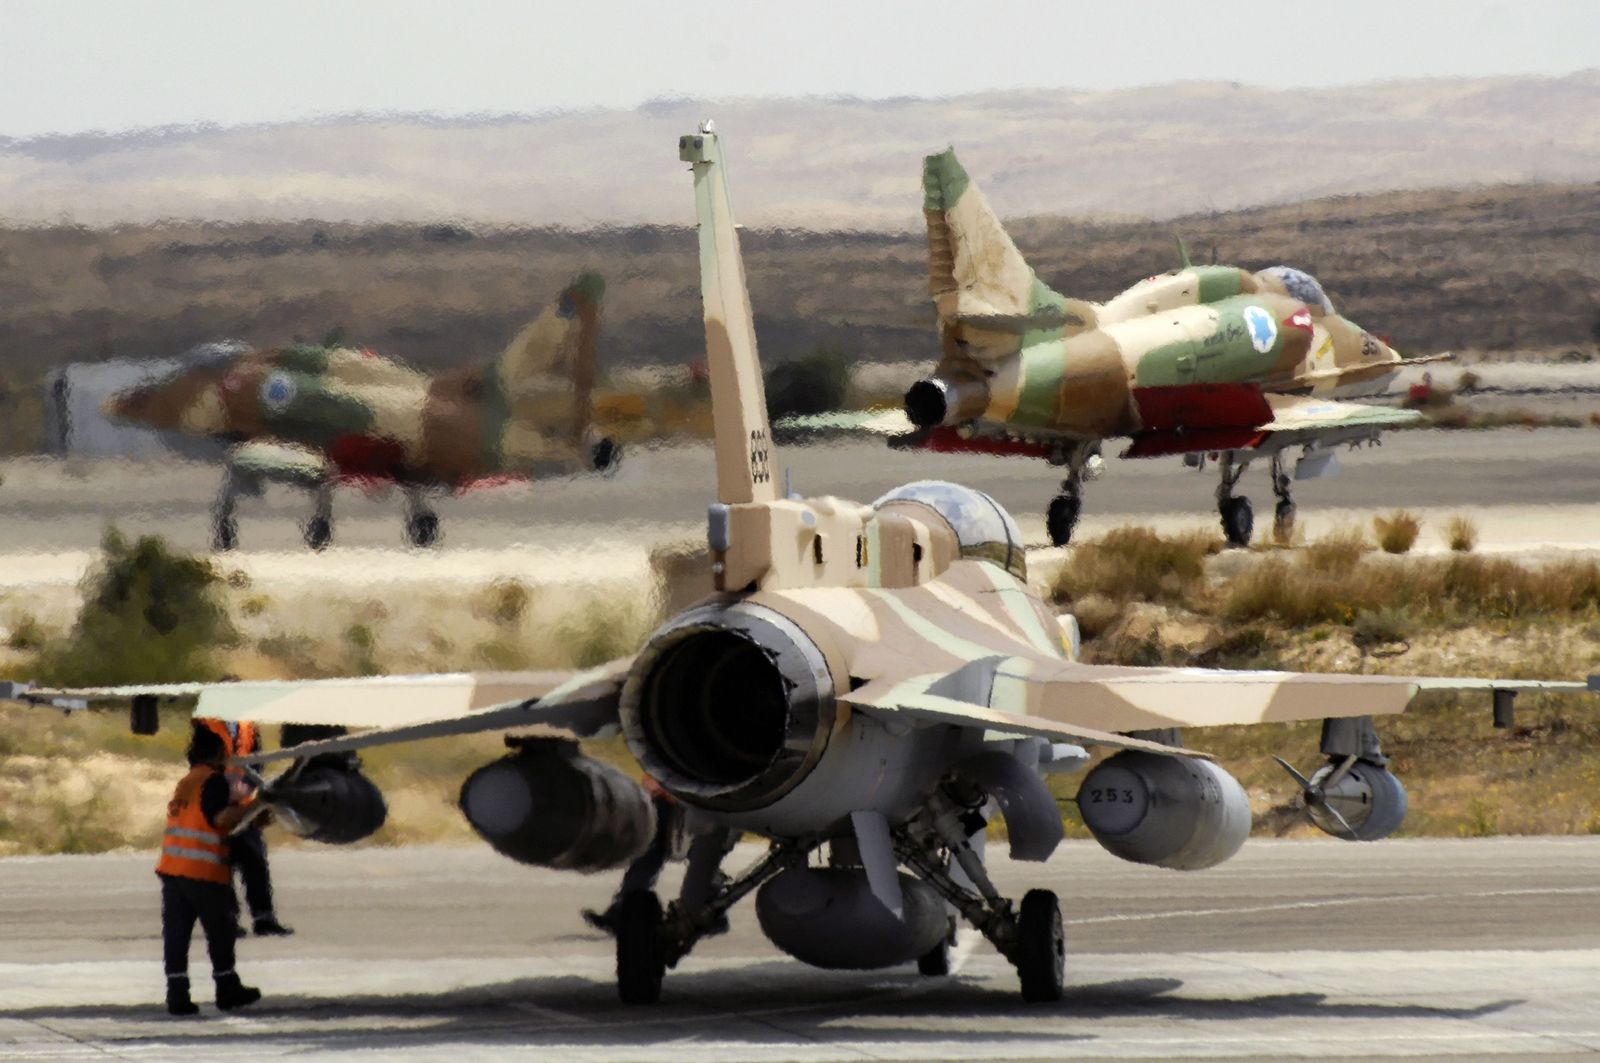 Israel F16